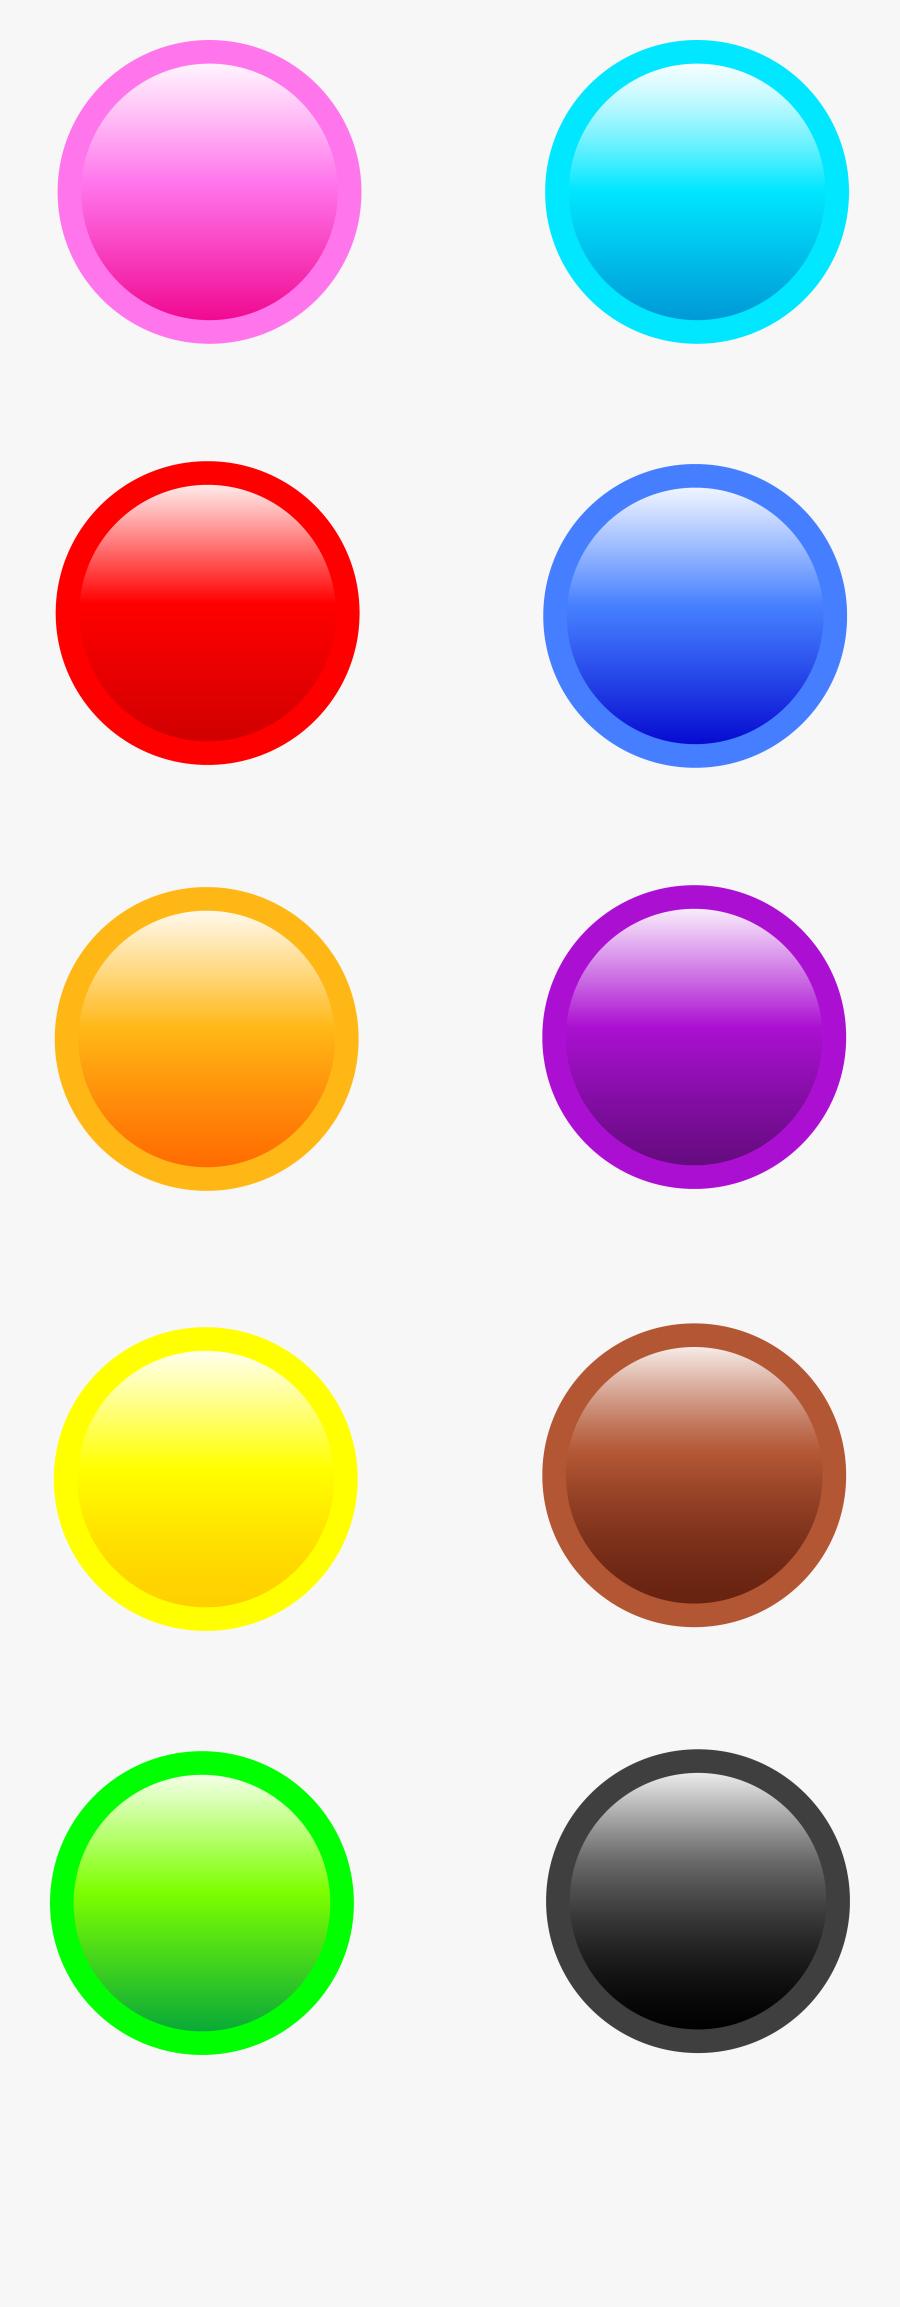 Button Clipart Website Png - Ten Buttons Clipart, Transparent Clipart